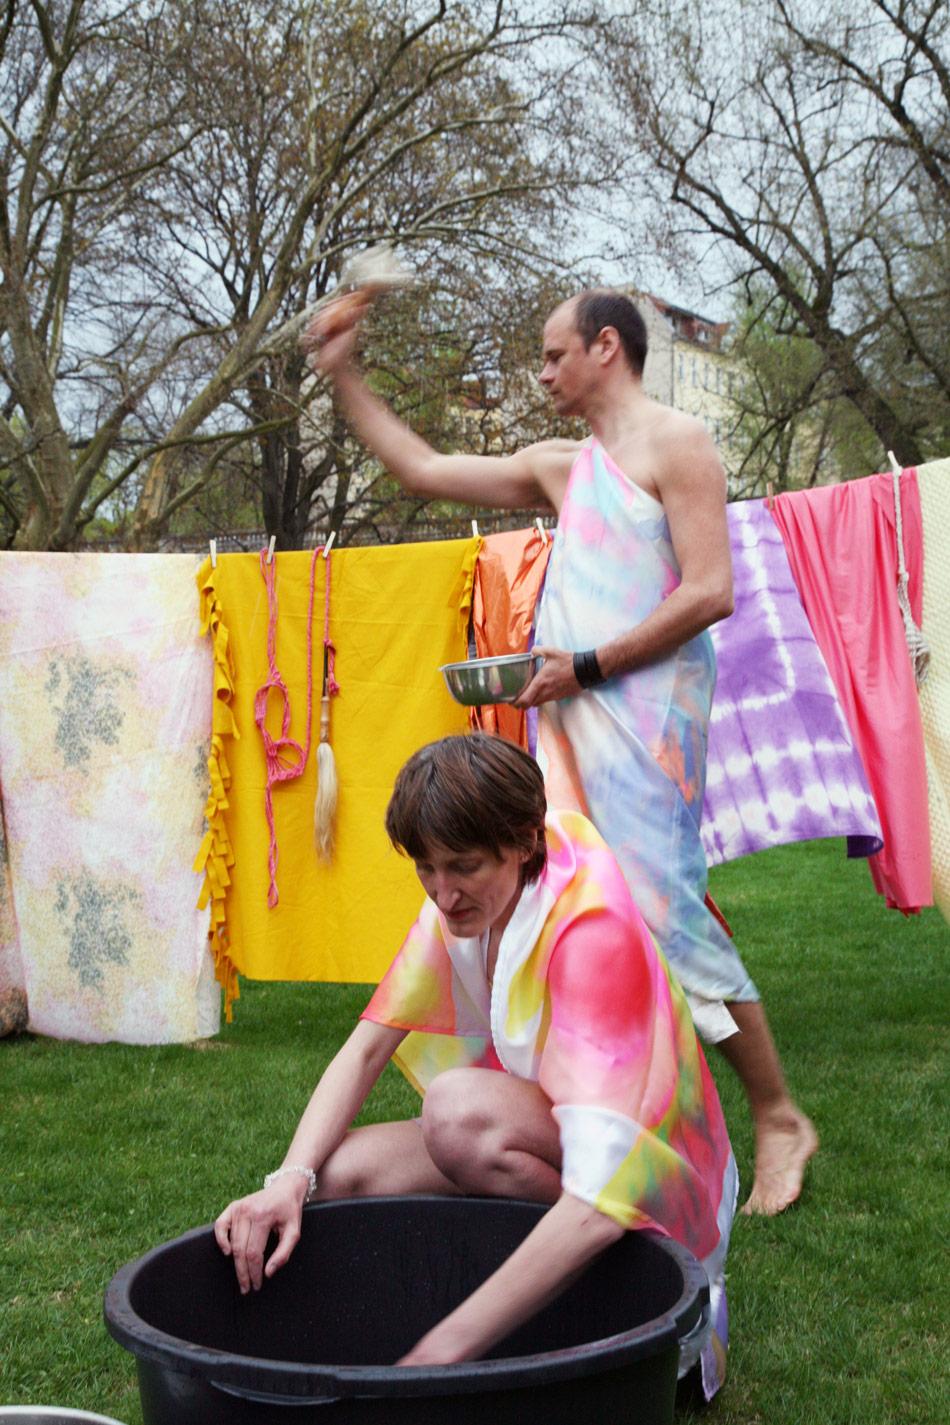 J&K, ter Heijne, Ray, Under Her Spell, participatory performance ritual, Galerie im Körnerpark, photos: Kai Dieterich